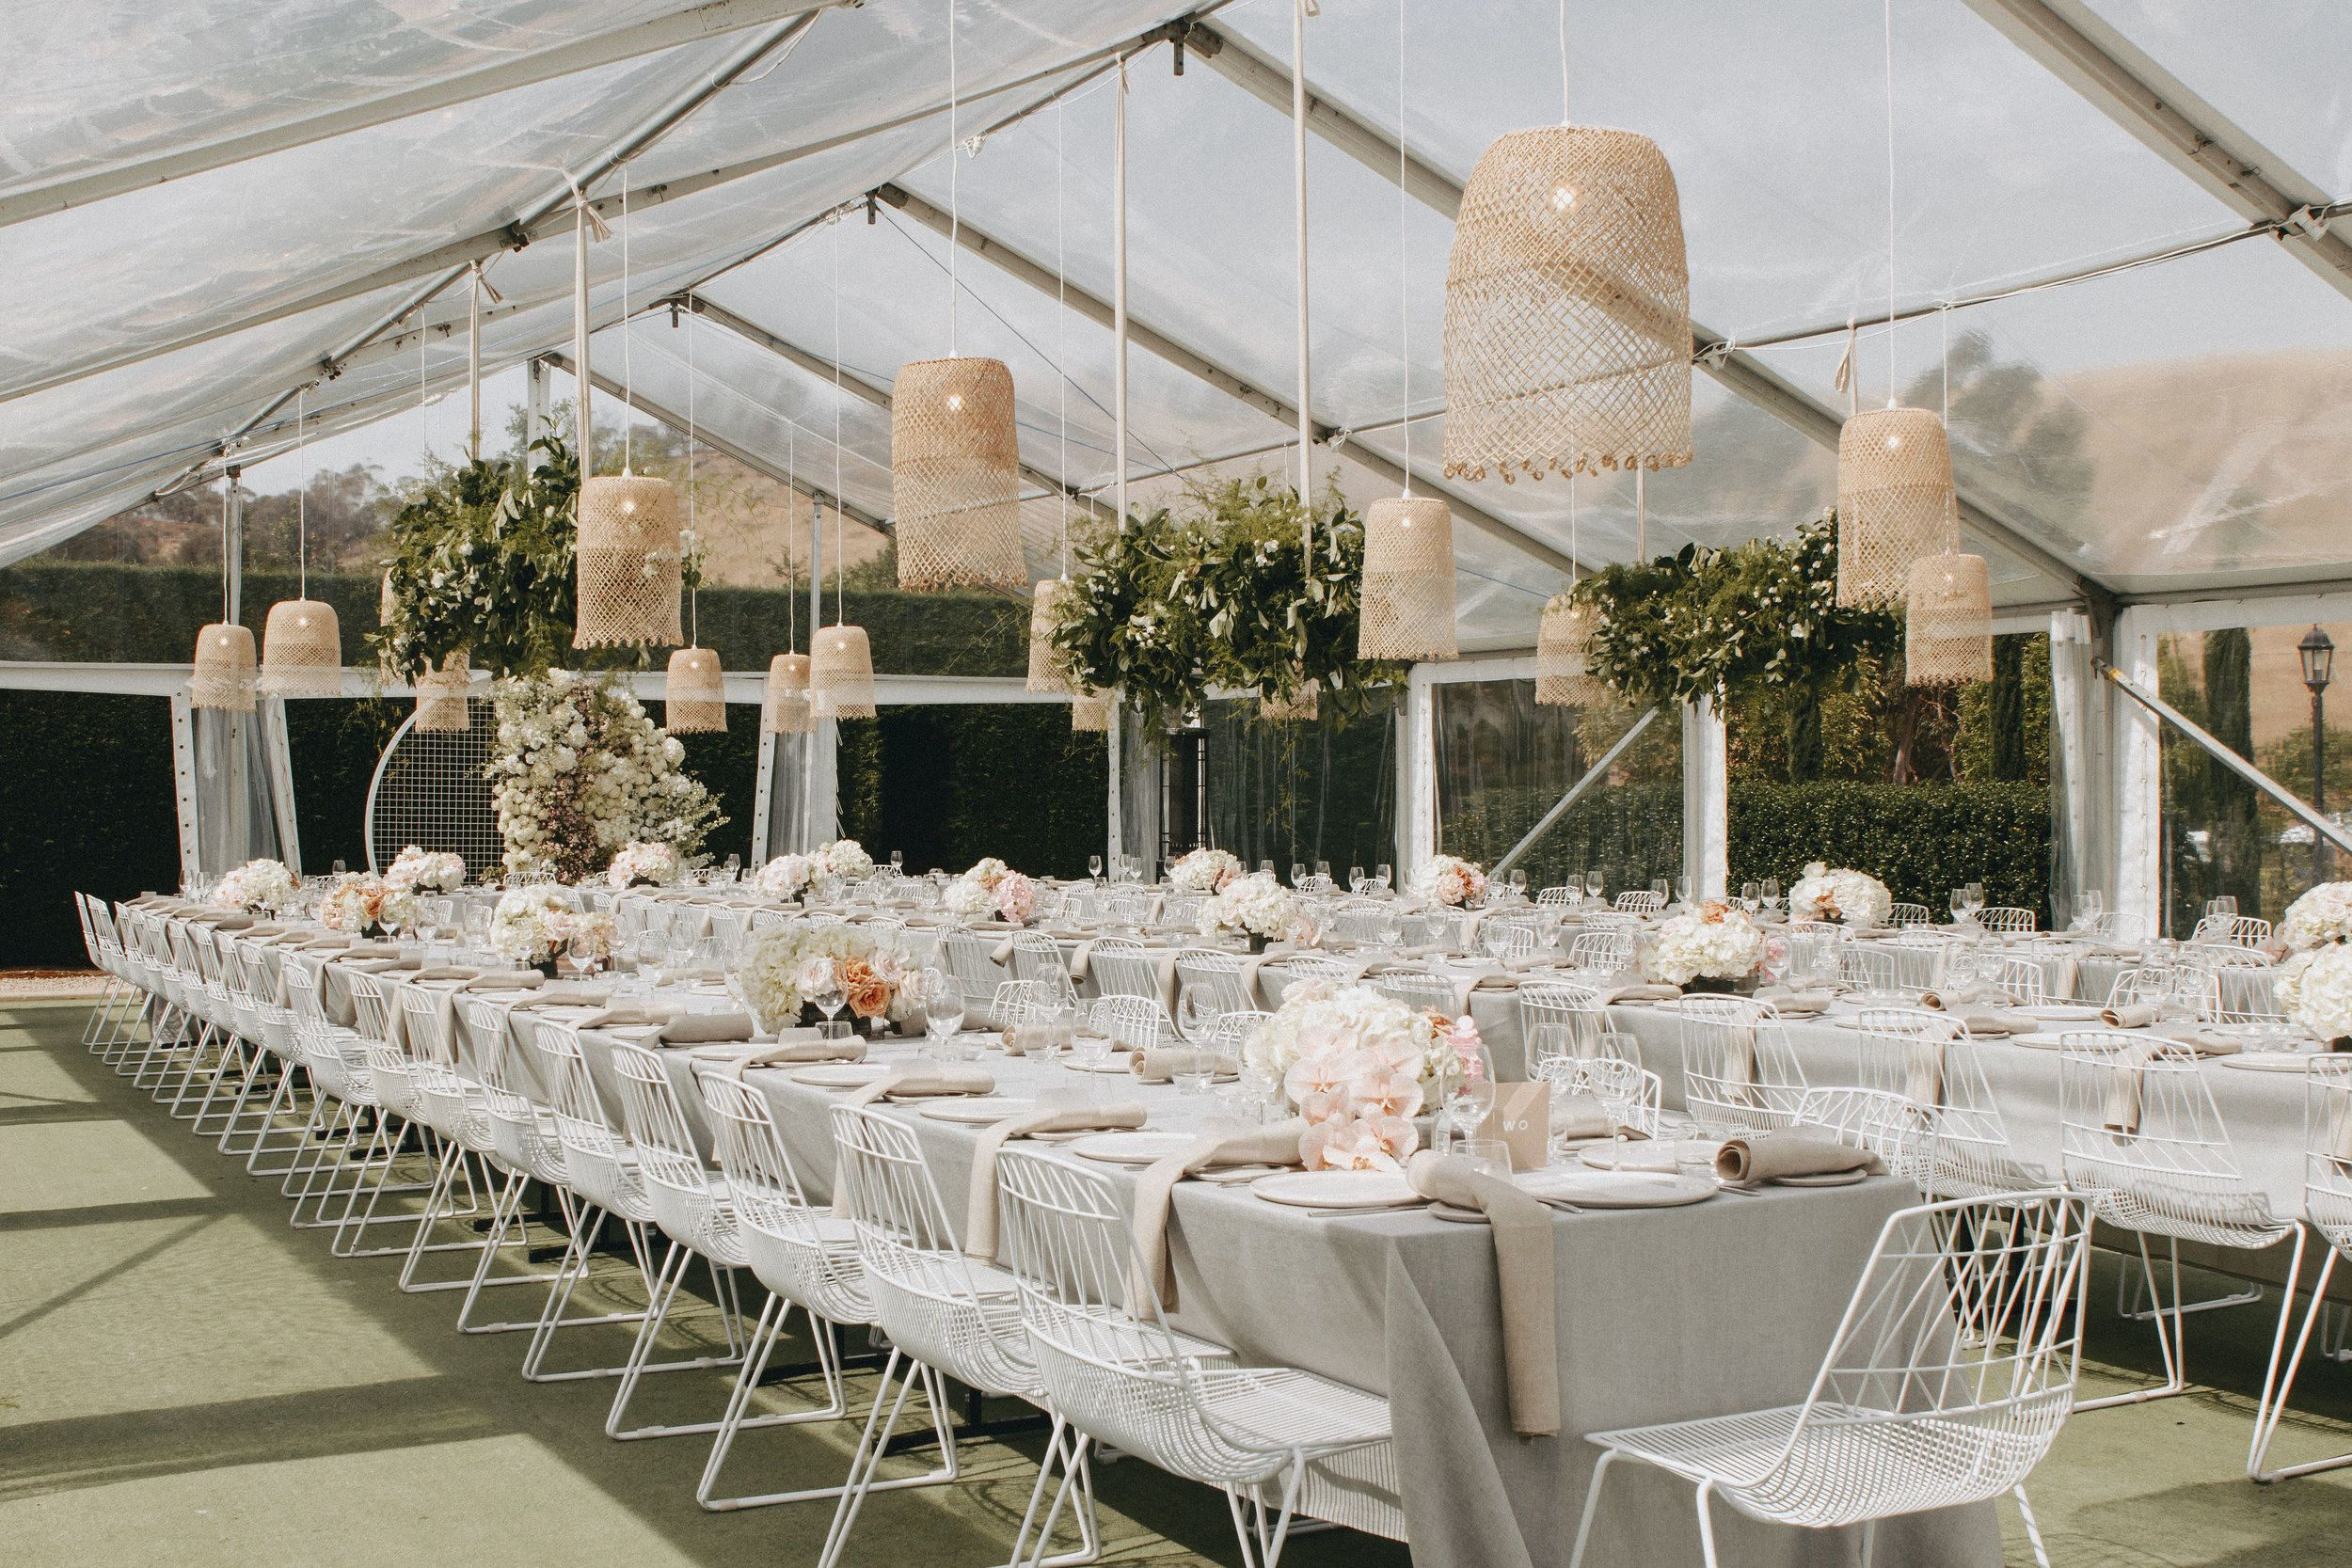 Cane Basket Pendant Lights In 2020 Tent Decorations Wedding